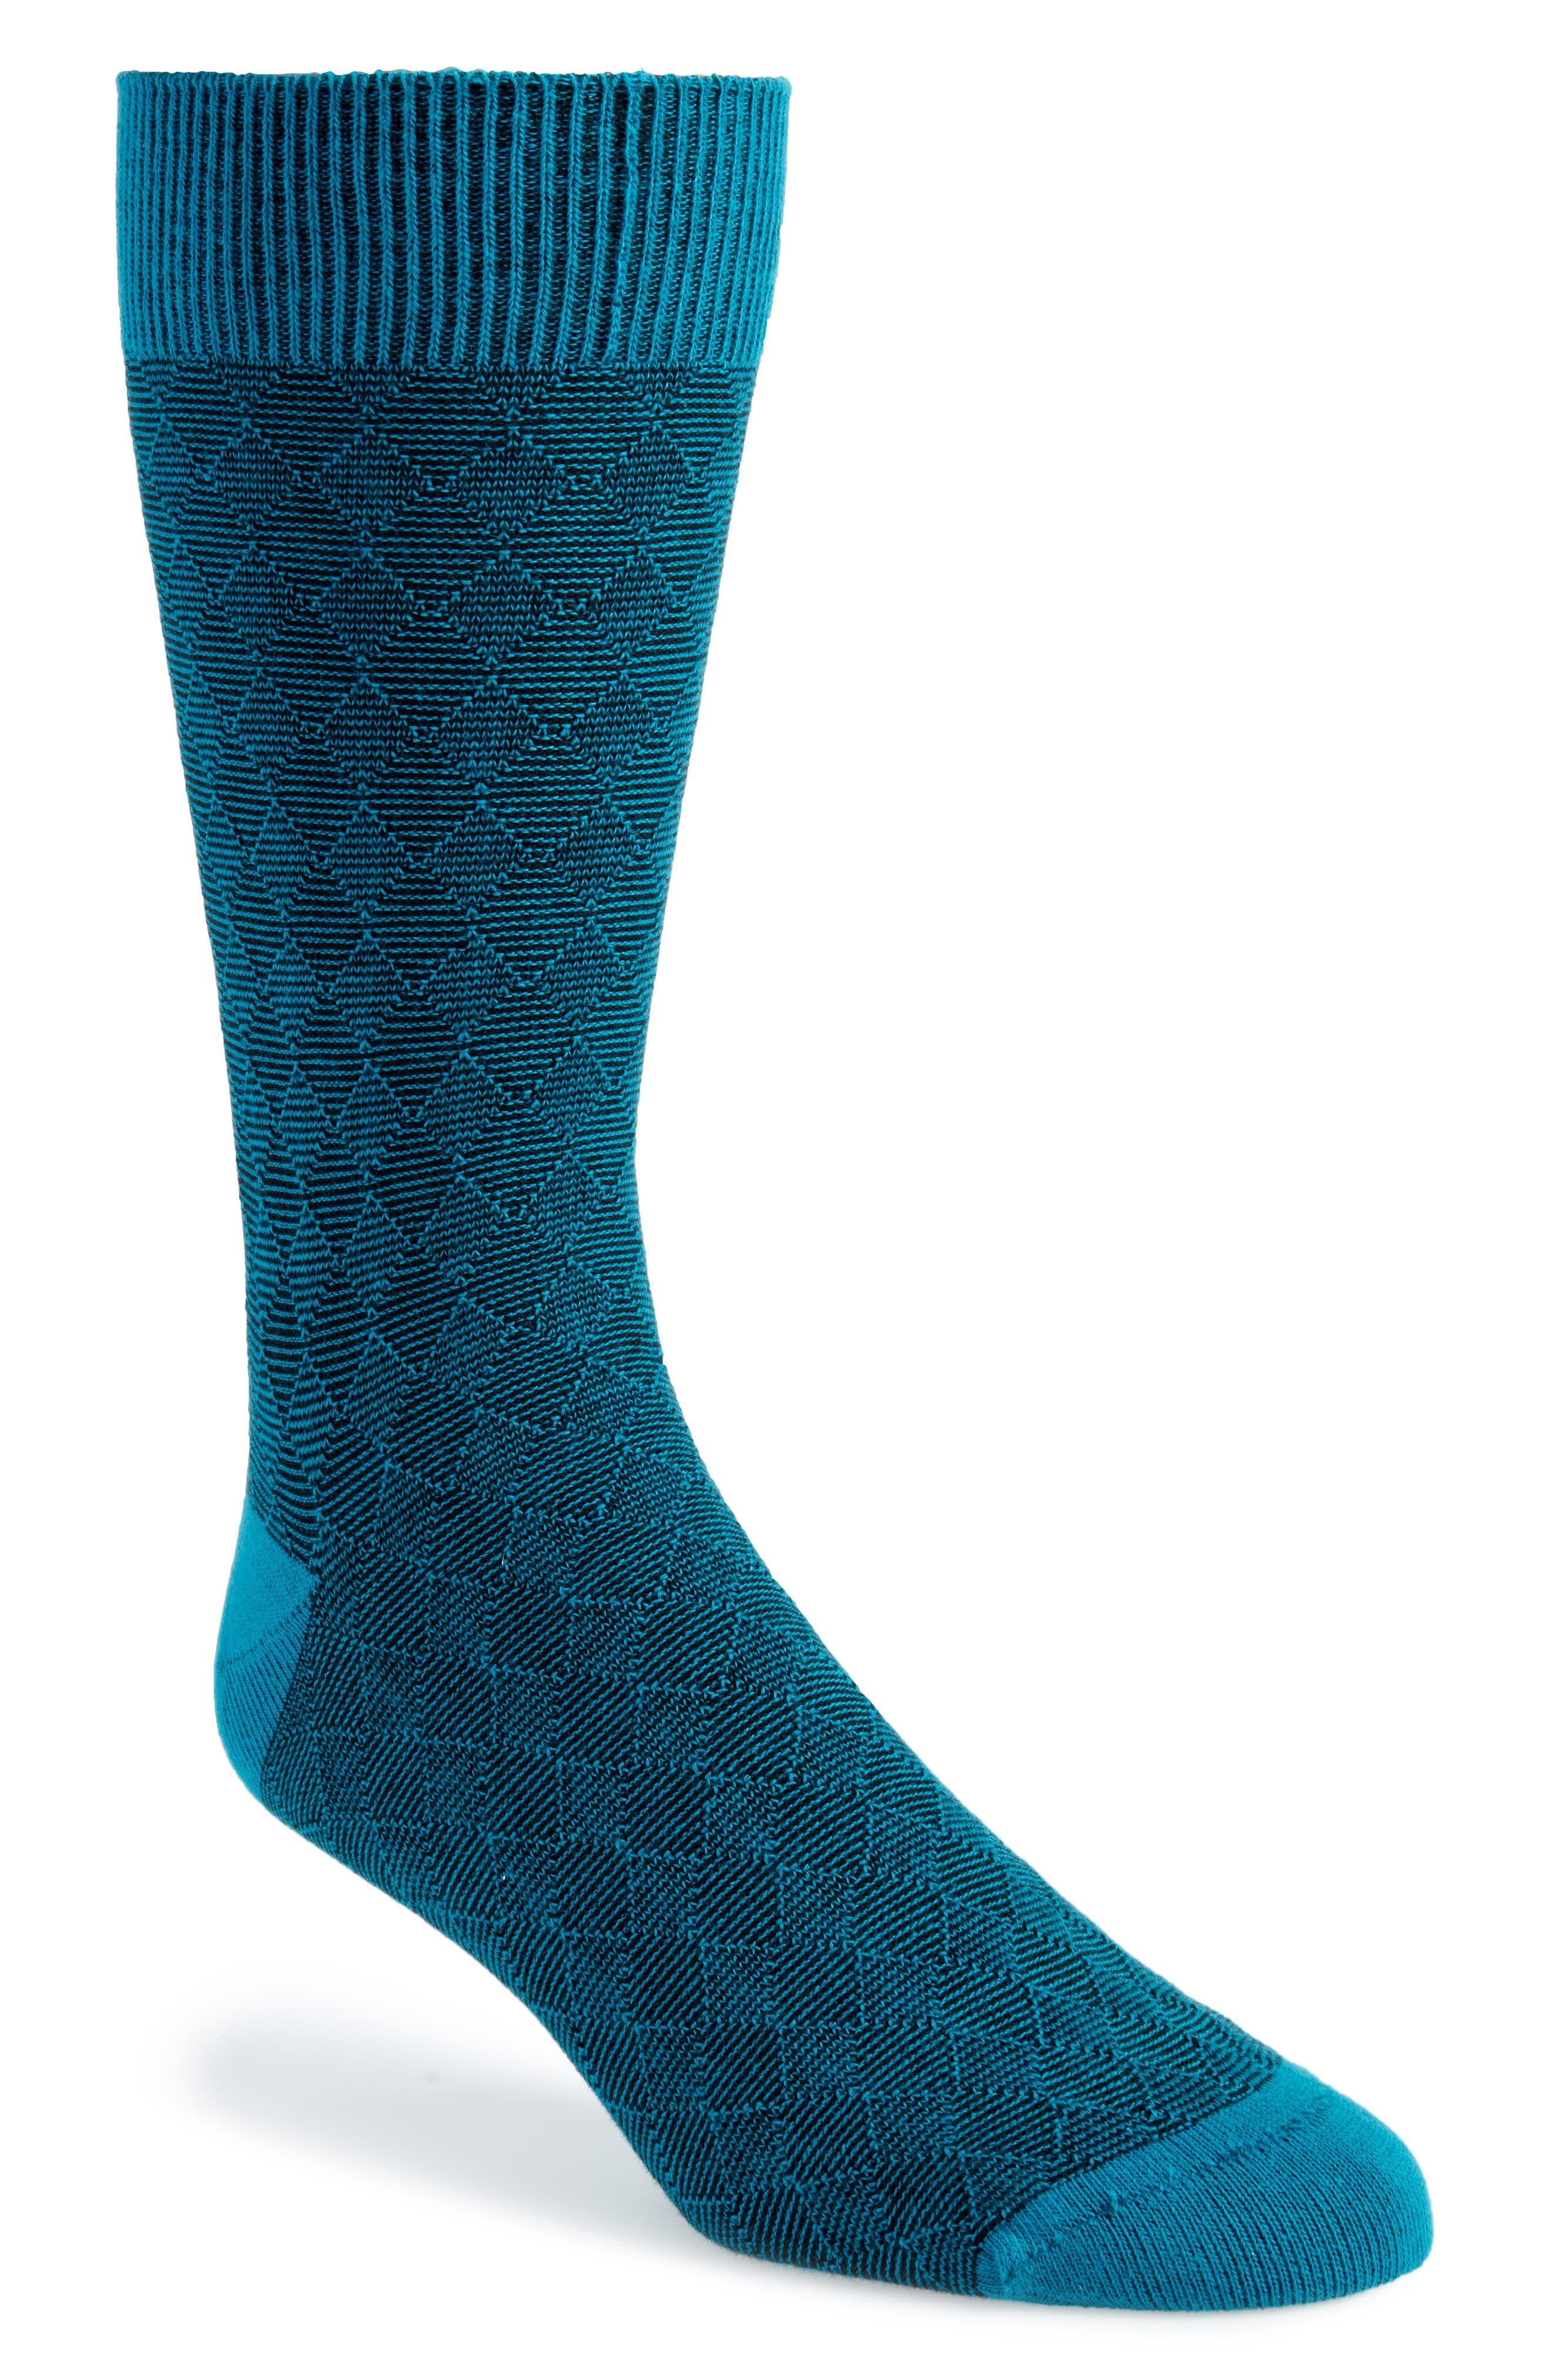 Diamond Textured Socks,                             Main thumbnail 1, color,                             Teal